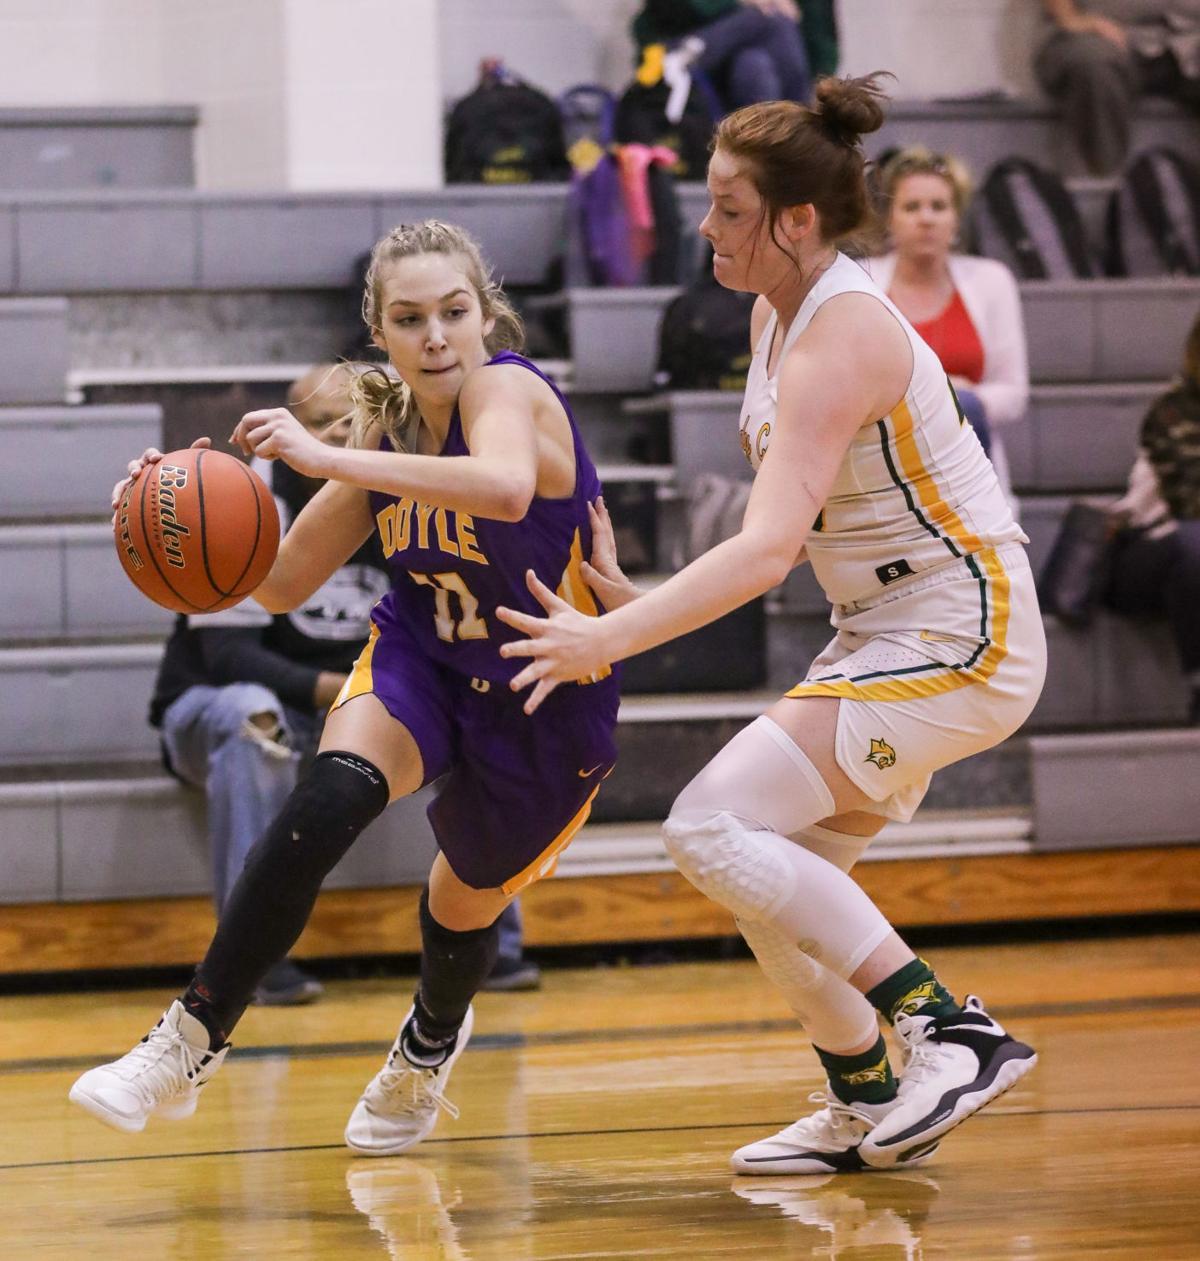 Doyle vs Walker girls basketball Presleigh Scott Victoria Smith